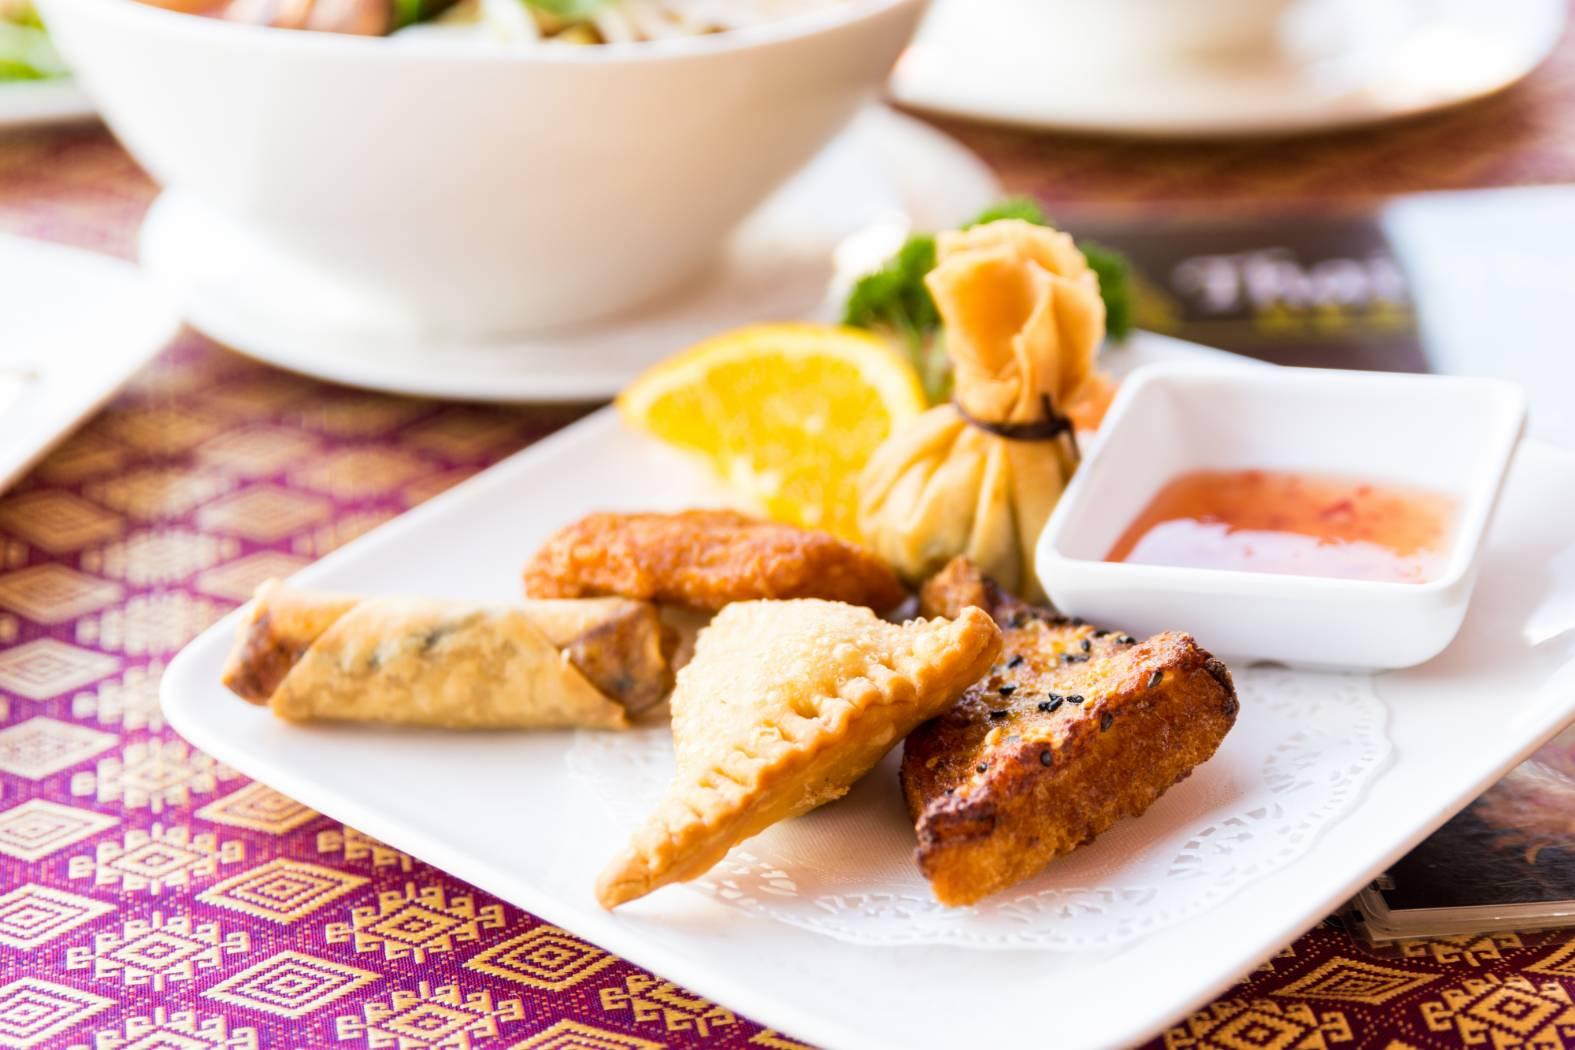 Thai%20thani%20restaurant%20tauranga%20%2811%29_1575x1050